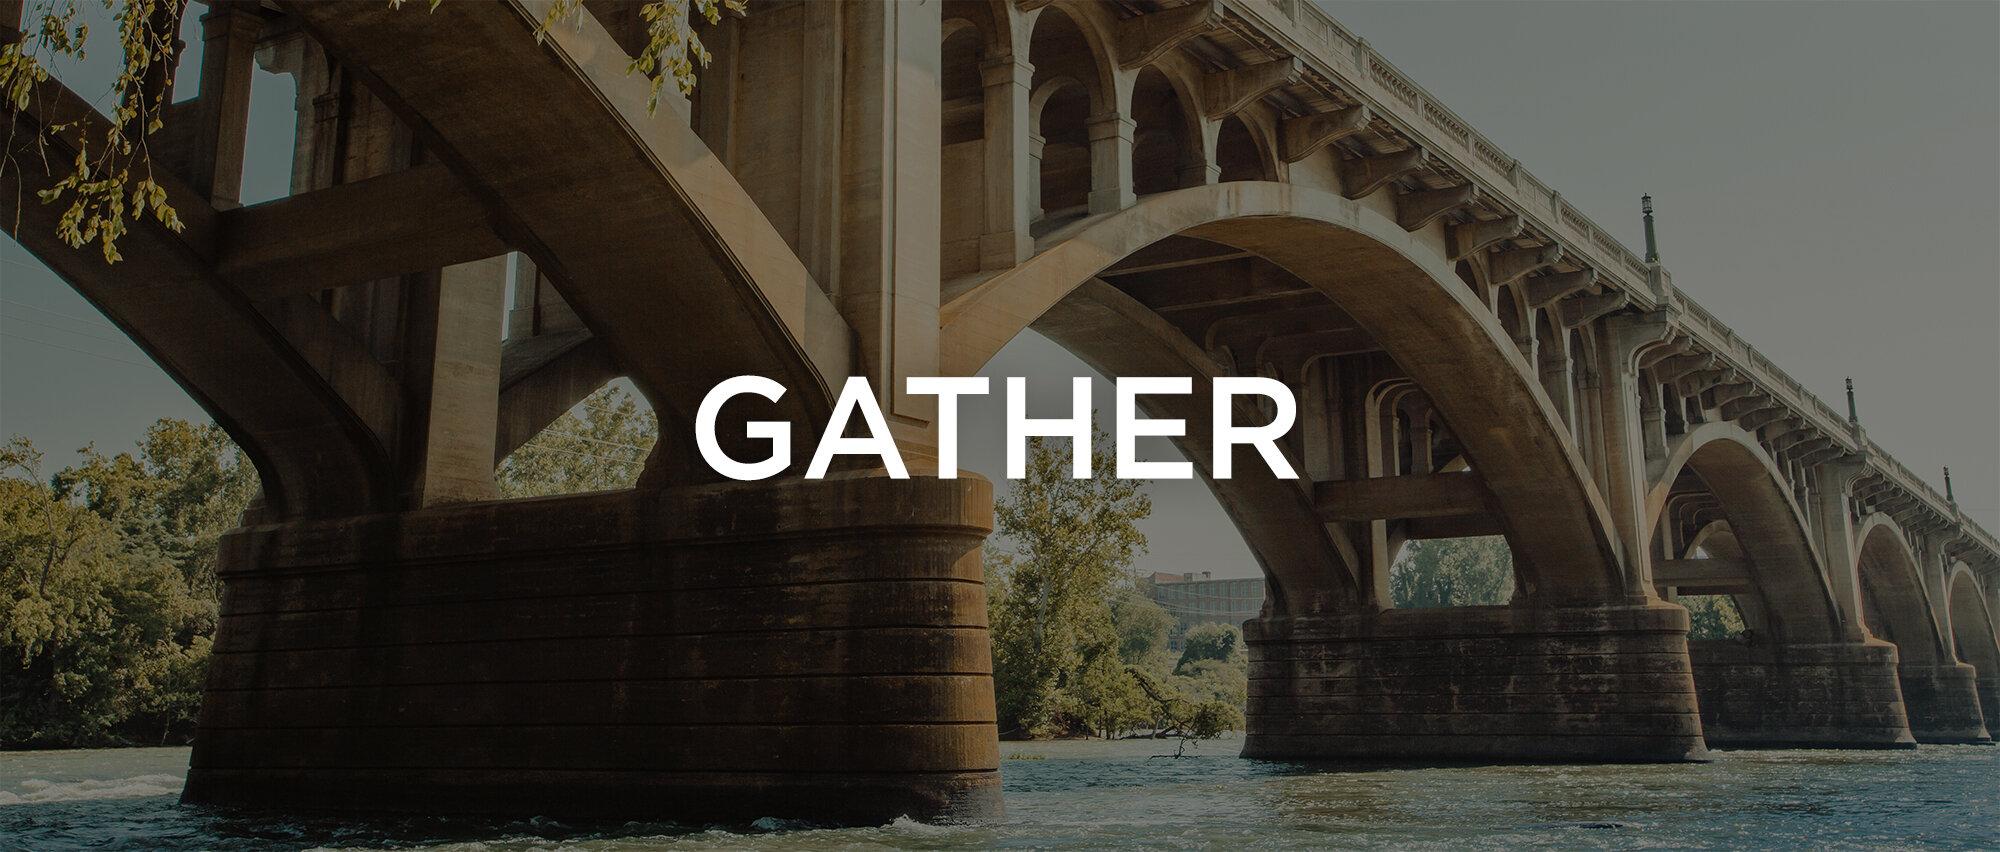 Gather.jpg